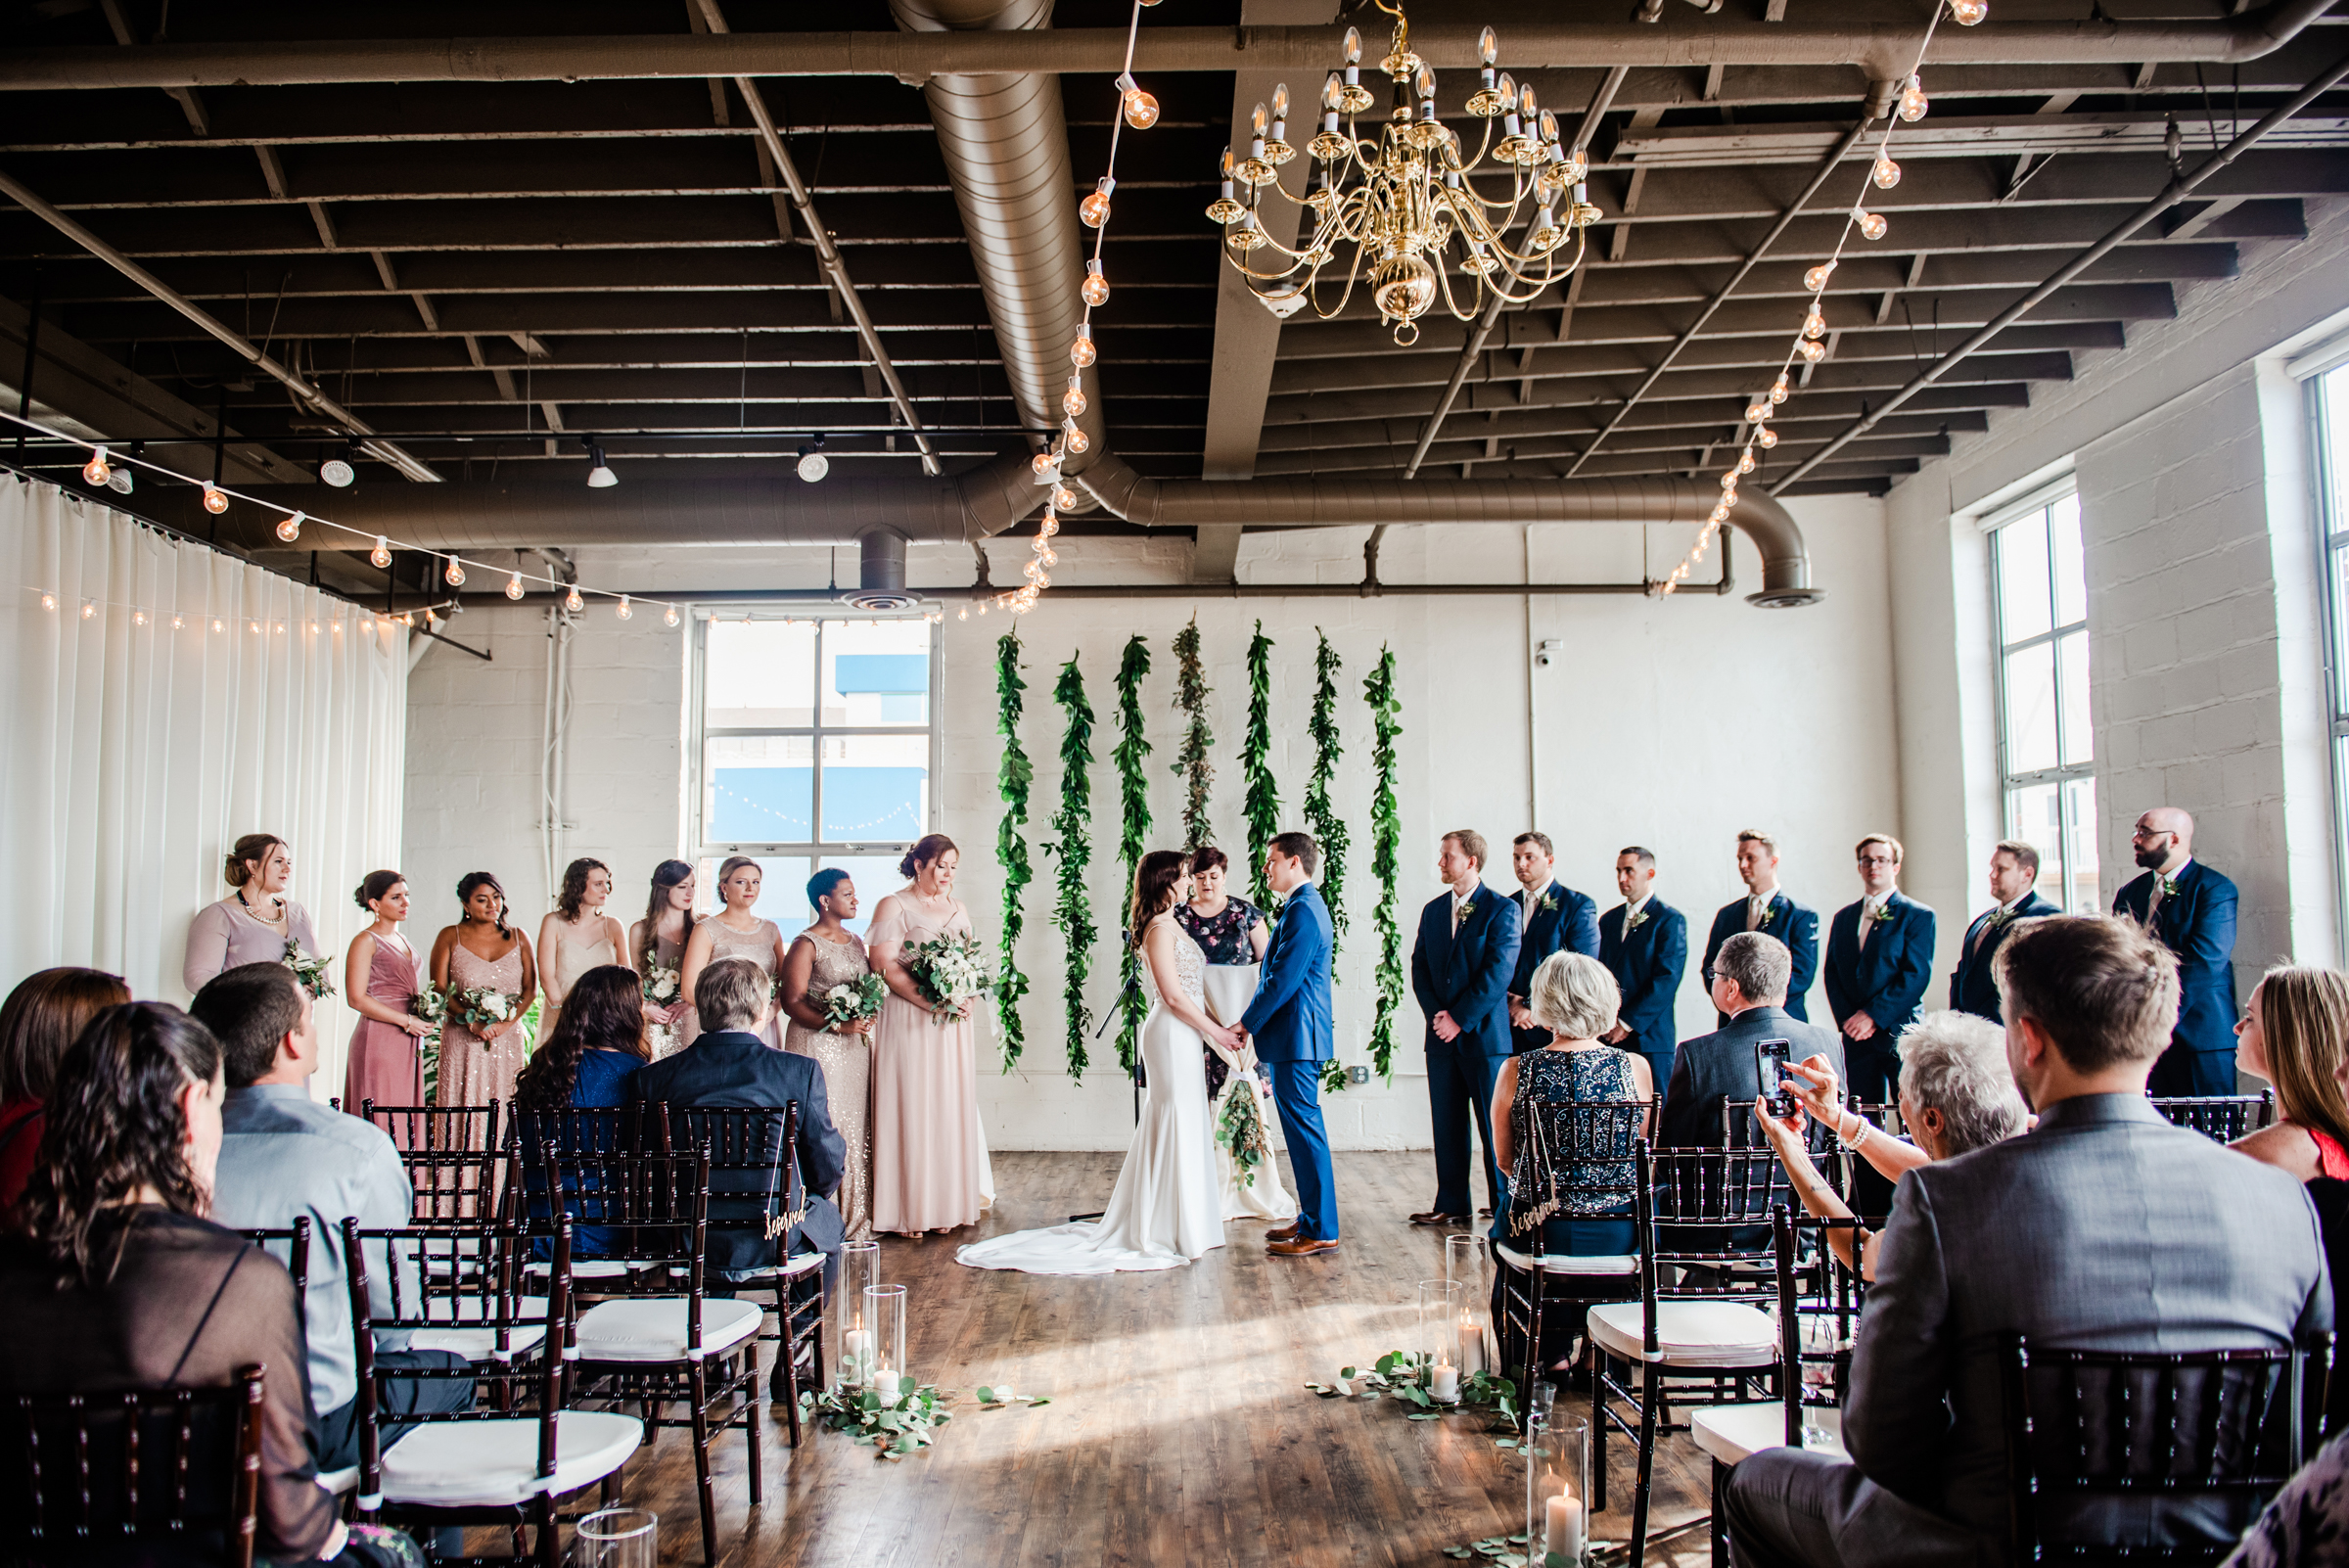 The_Arbor_LoftRochester_Wedding_JILL_STUDIO_Rochester_NY_Photographer_170533.jpg